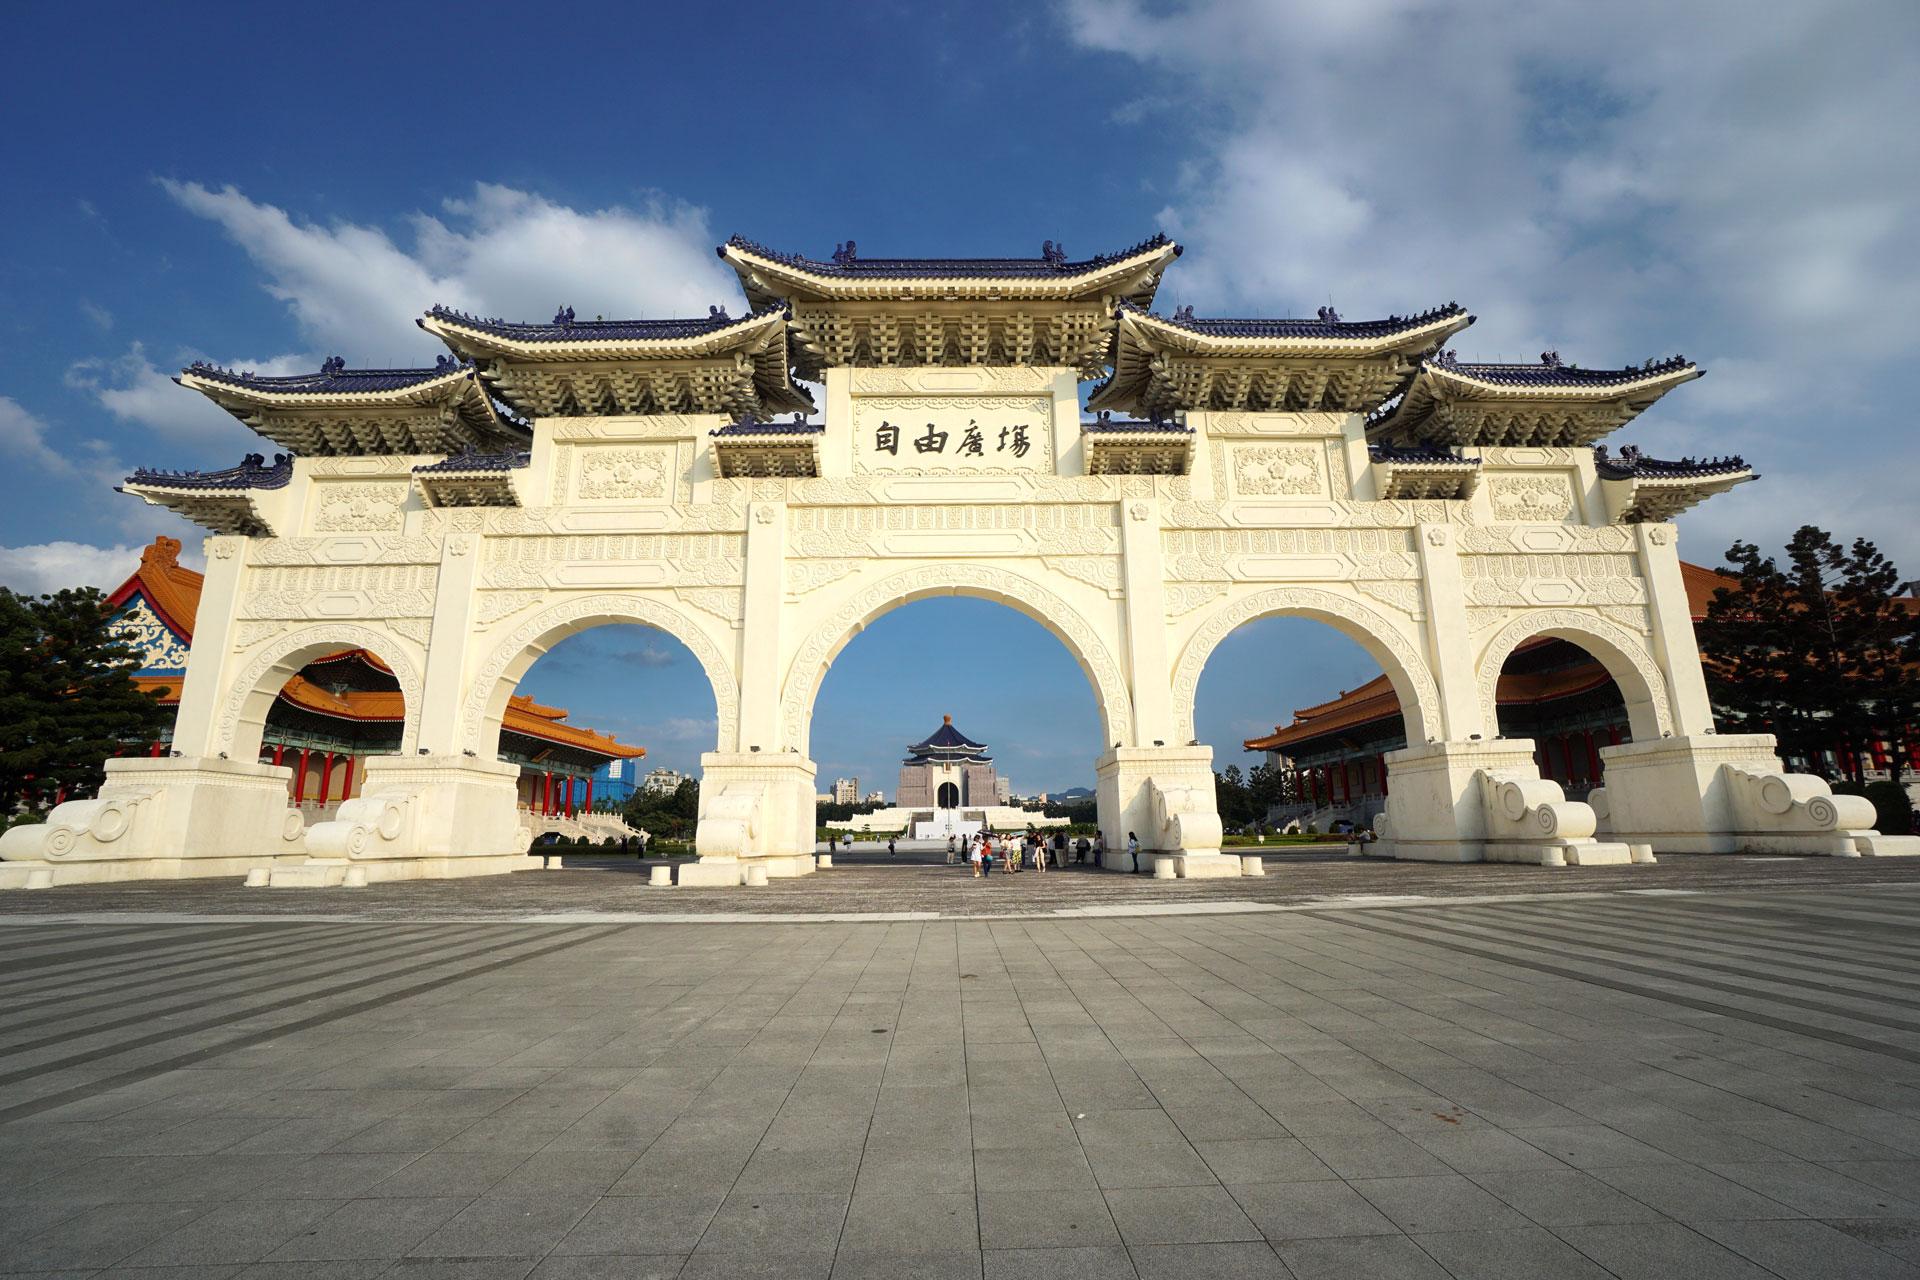 Kolossales Eingangstor mit Blick auf die National Chiang Kai-shek Memorial Hall